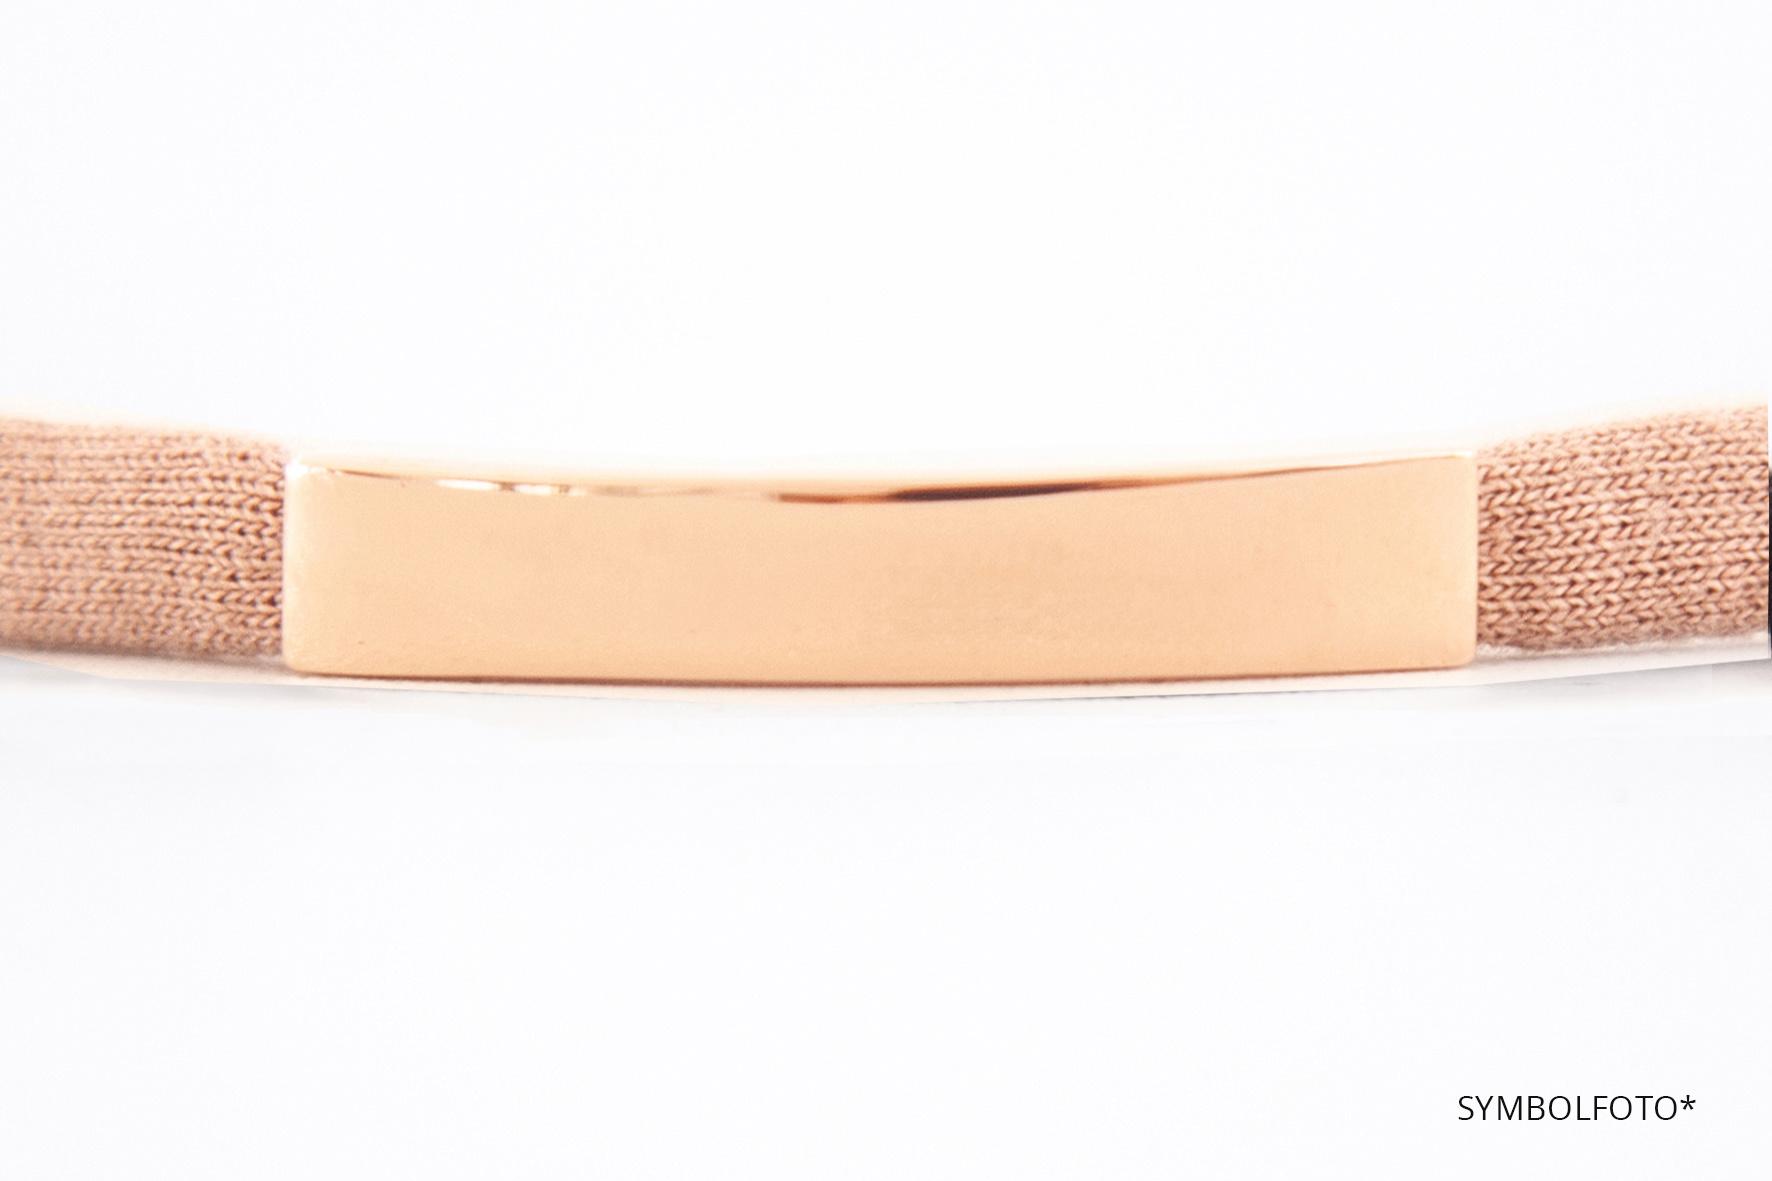 PERSÖNLICHE GRAVUR/ rosegold glossy /N*dividual